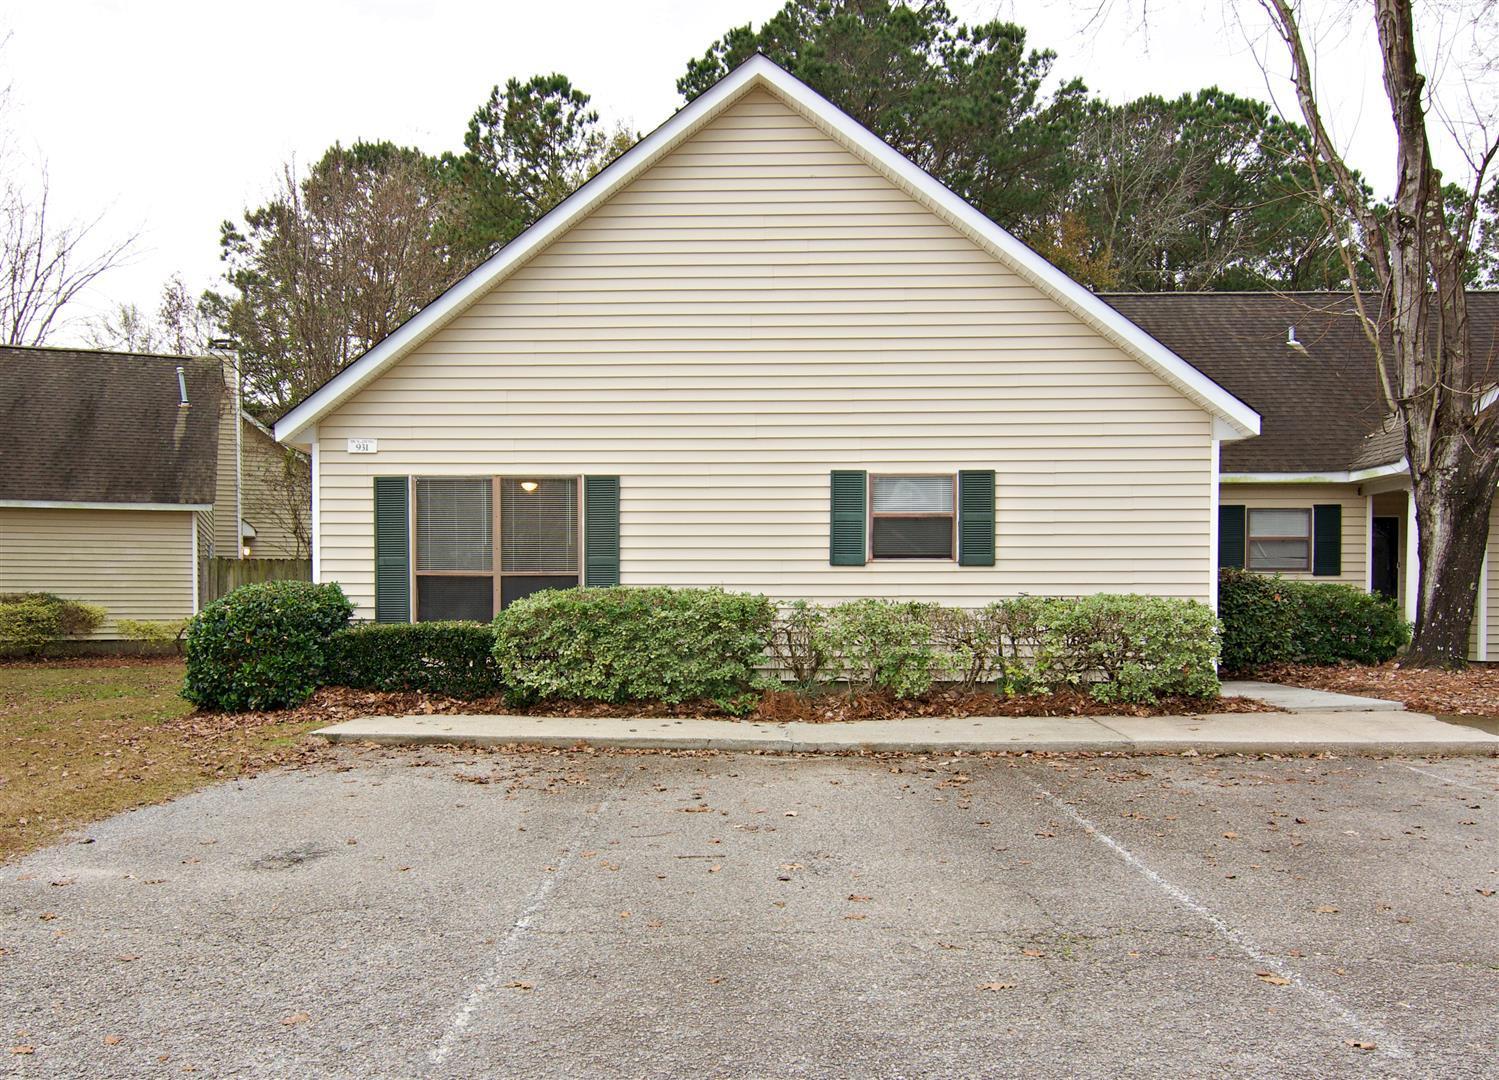 Shaftesbury Woods Homes For Sale - 931 Estates, Charleston, SC - 16